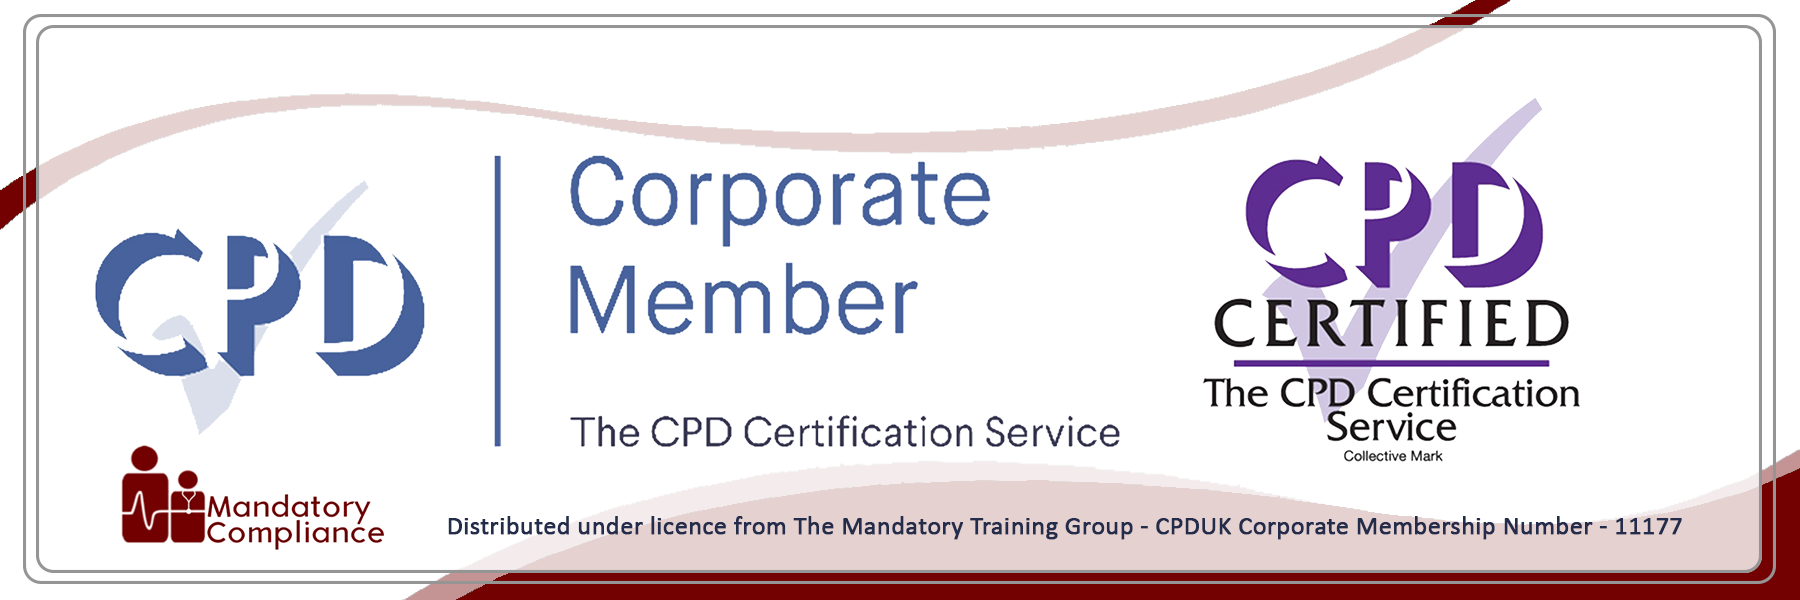 Fundamentals of Project Management -Online Training Course - The Mandatory Training Group UK -